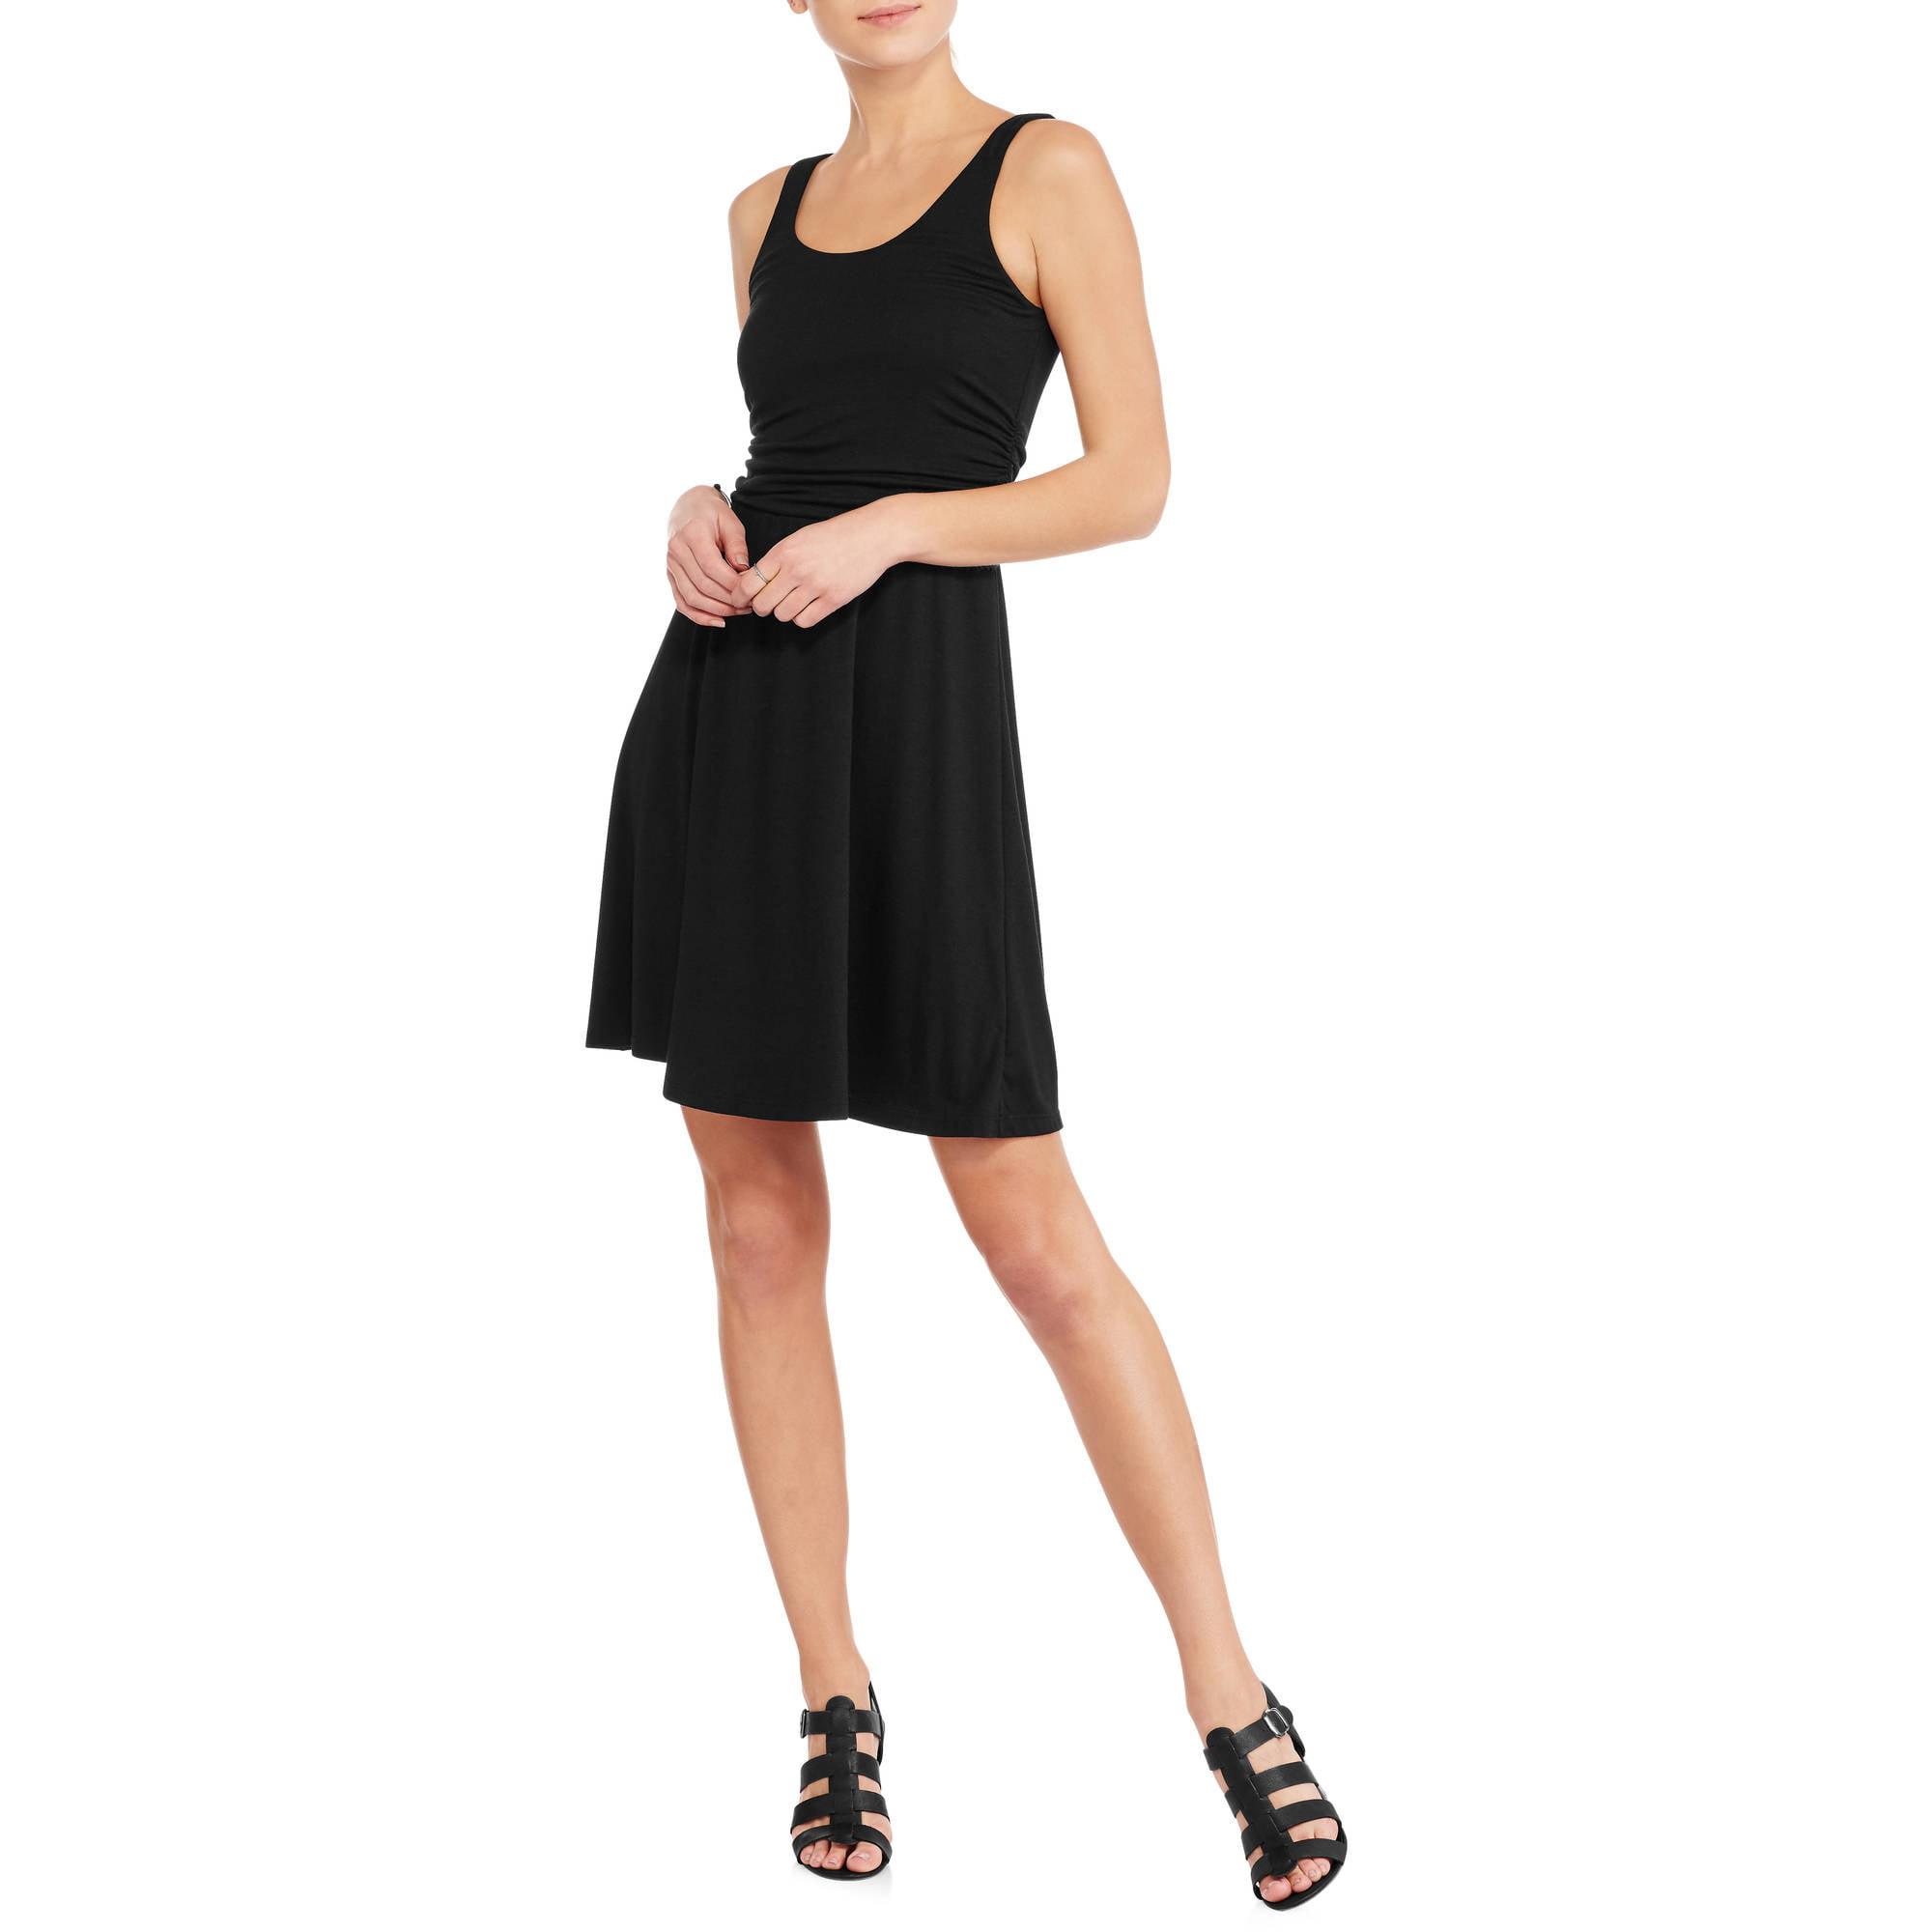 Faded Glory Women's Easy Knit Shirred Flip Flop Dress by FADED GLORY